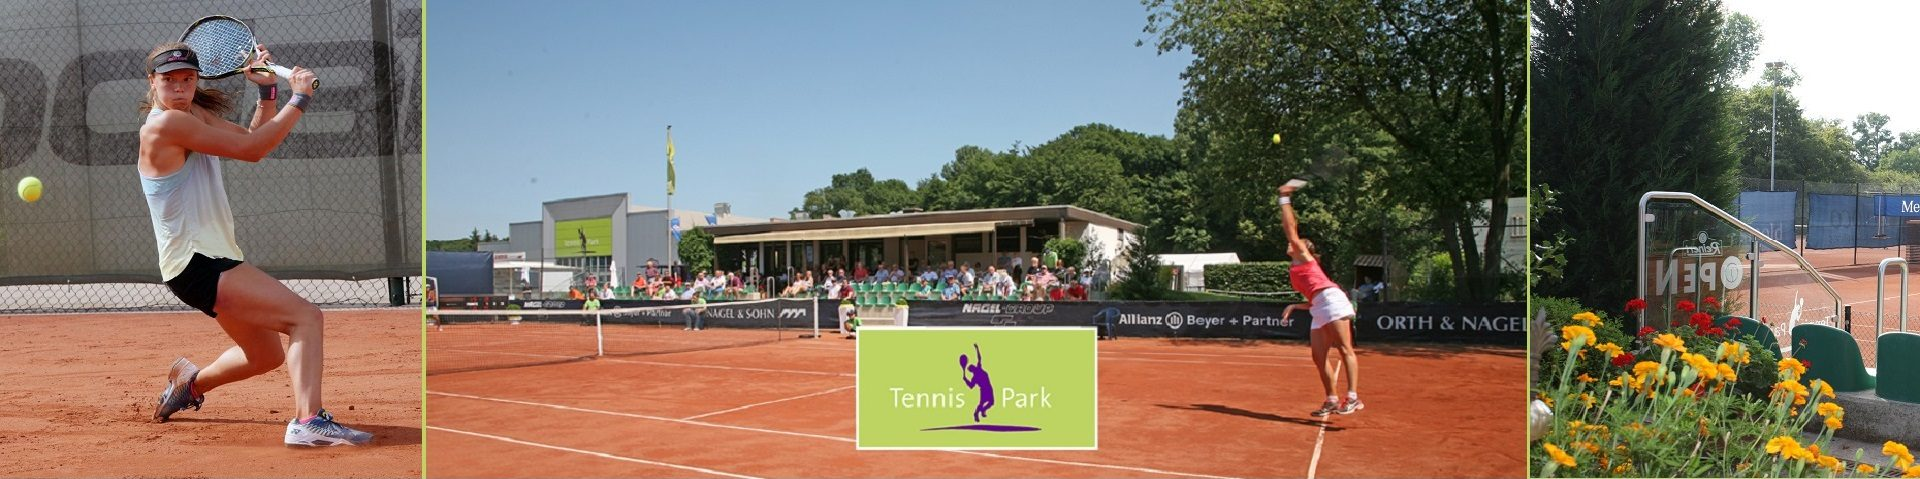 Tennispark Versmold e. V.